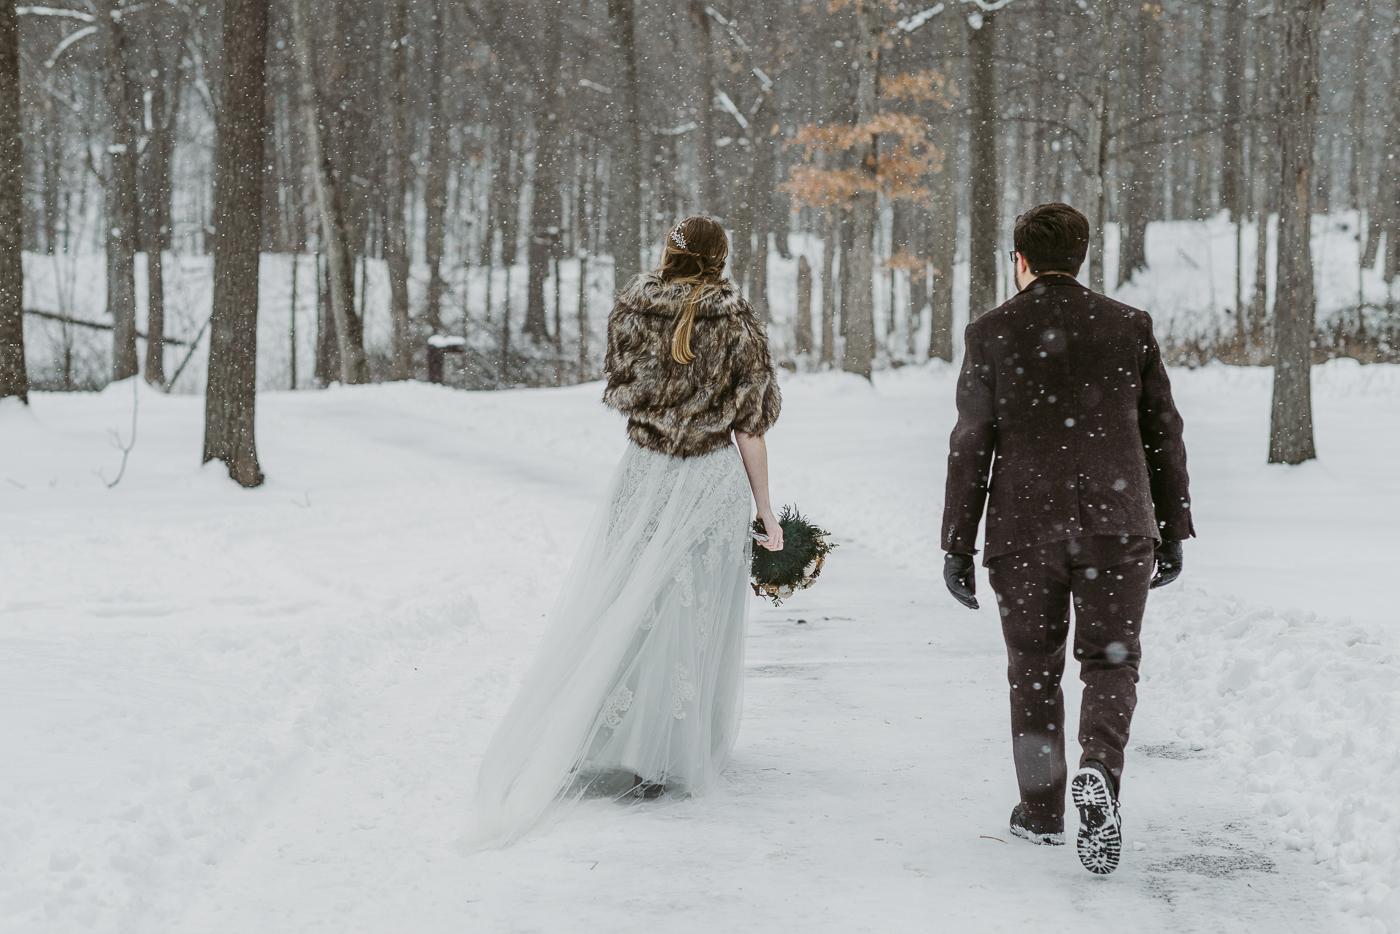 Squires-Castle-Winter-Wedding-17.jpg